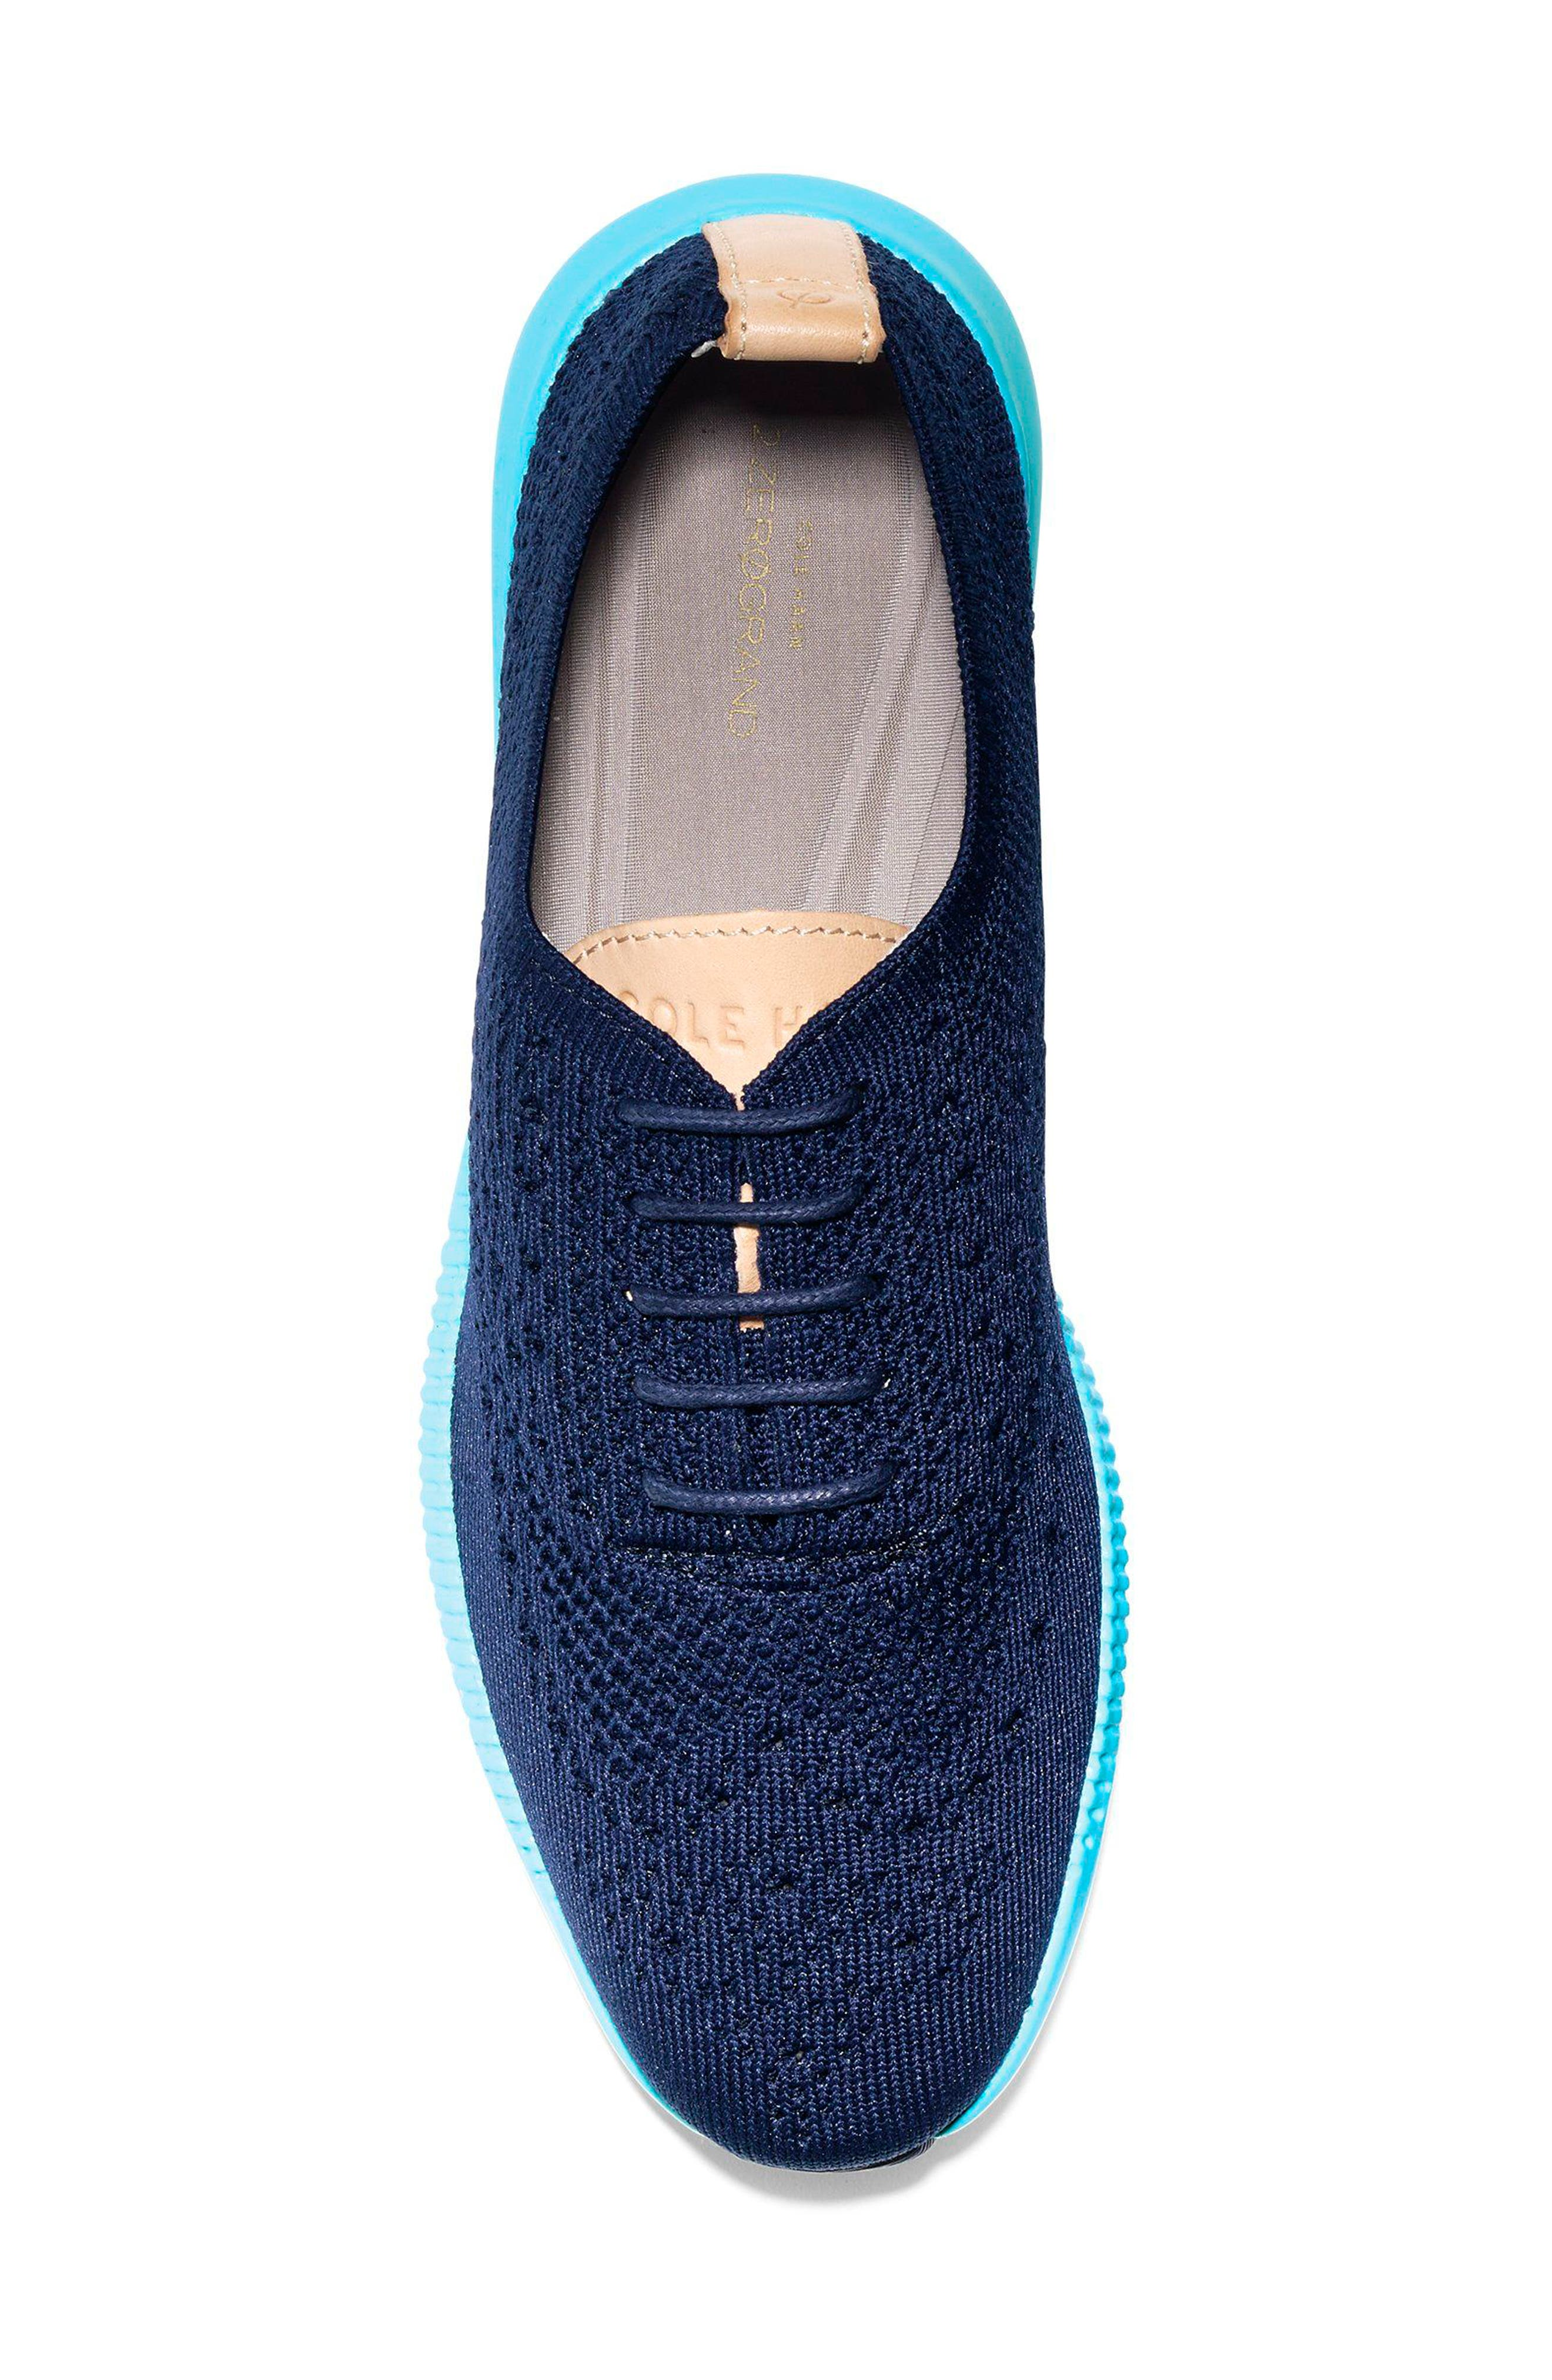 2.ZERØGRAND Stitchlite Wingtip Sneaker,                             Alternate thumbnail 5, color,                             MARINE BLUE/ BLUEFISH FABRIC